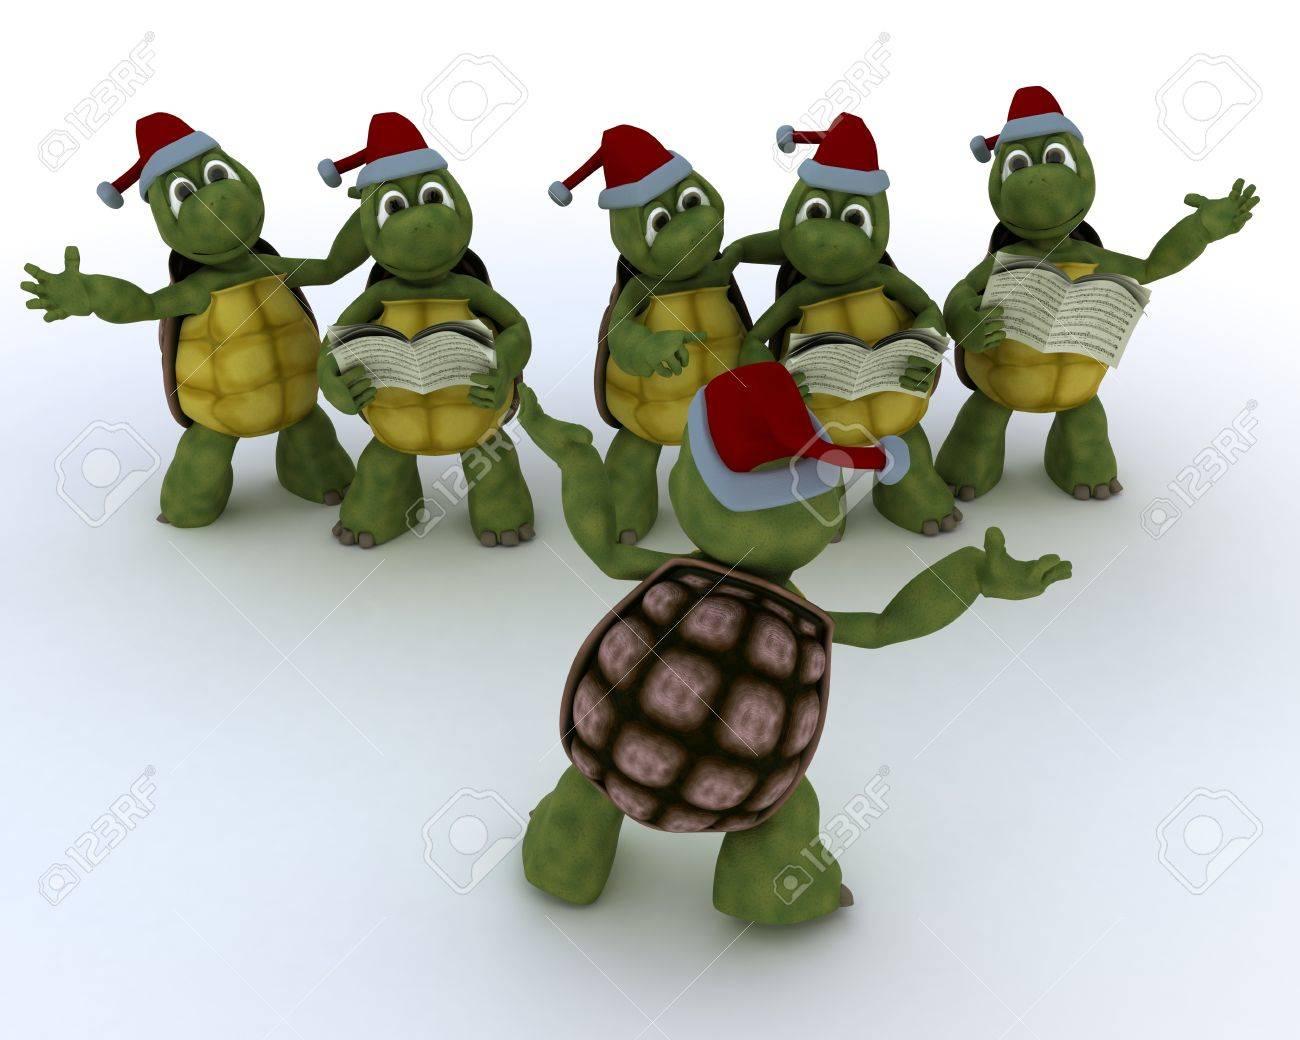 3D Render of a tortoises singing christmas carols Stock Photo - 21592457